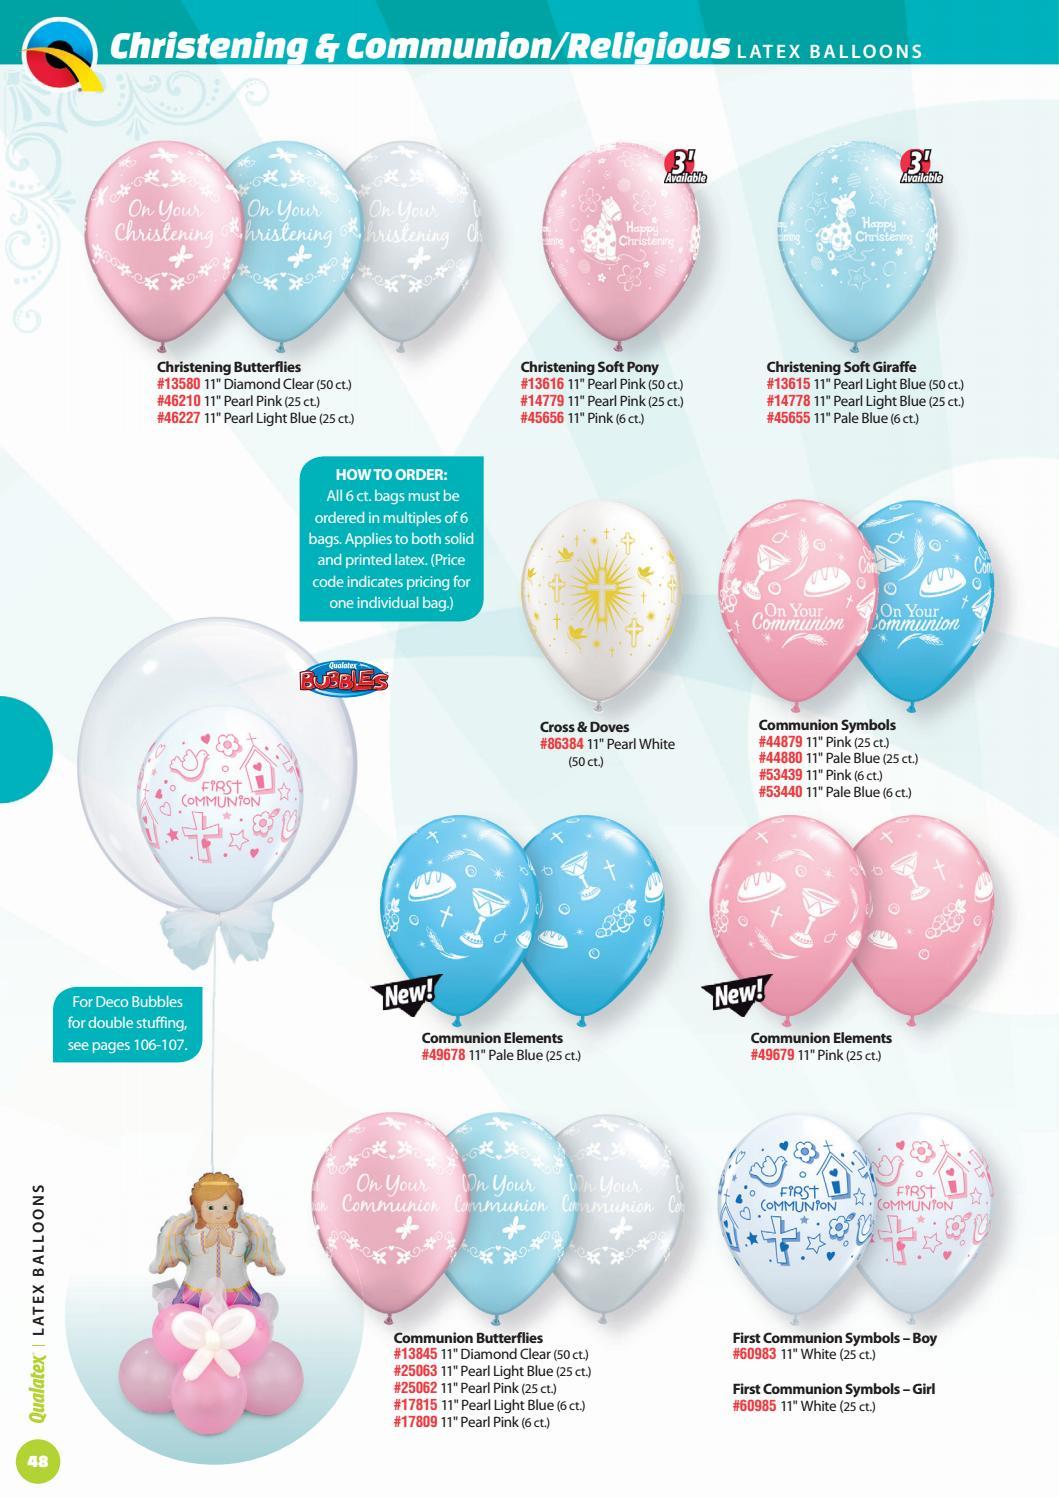 "Boy Latex Balloons 50 Count 11/"" First Communion Symbols"